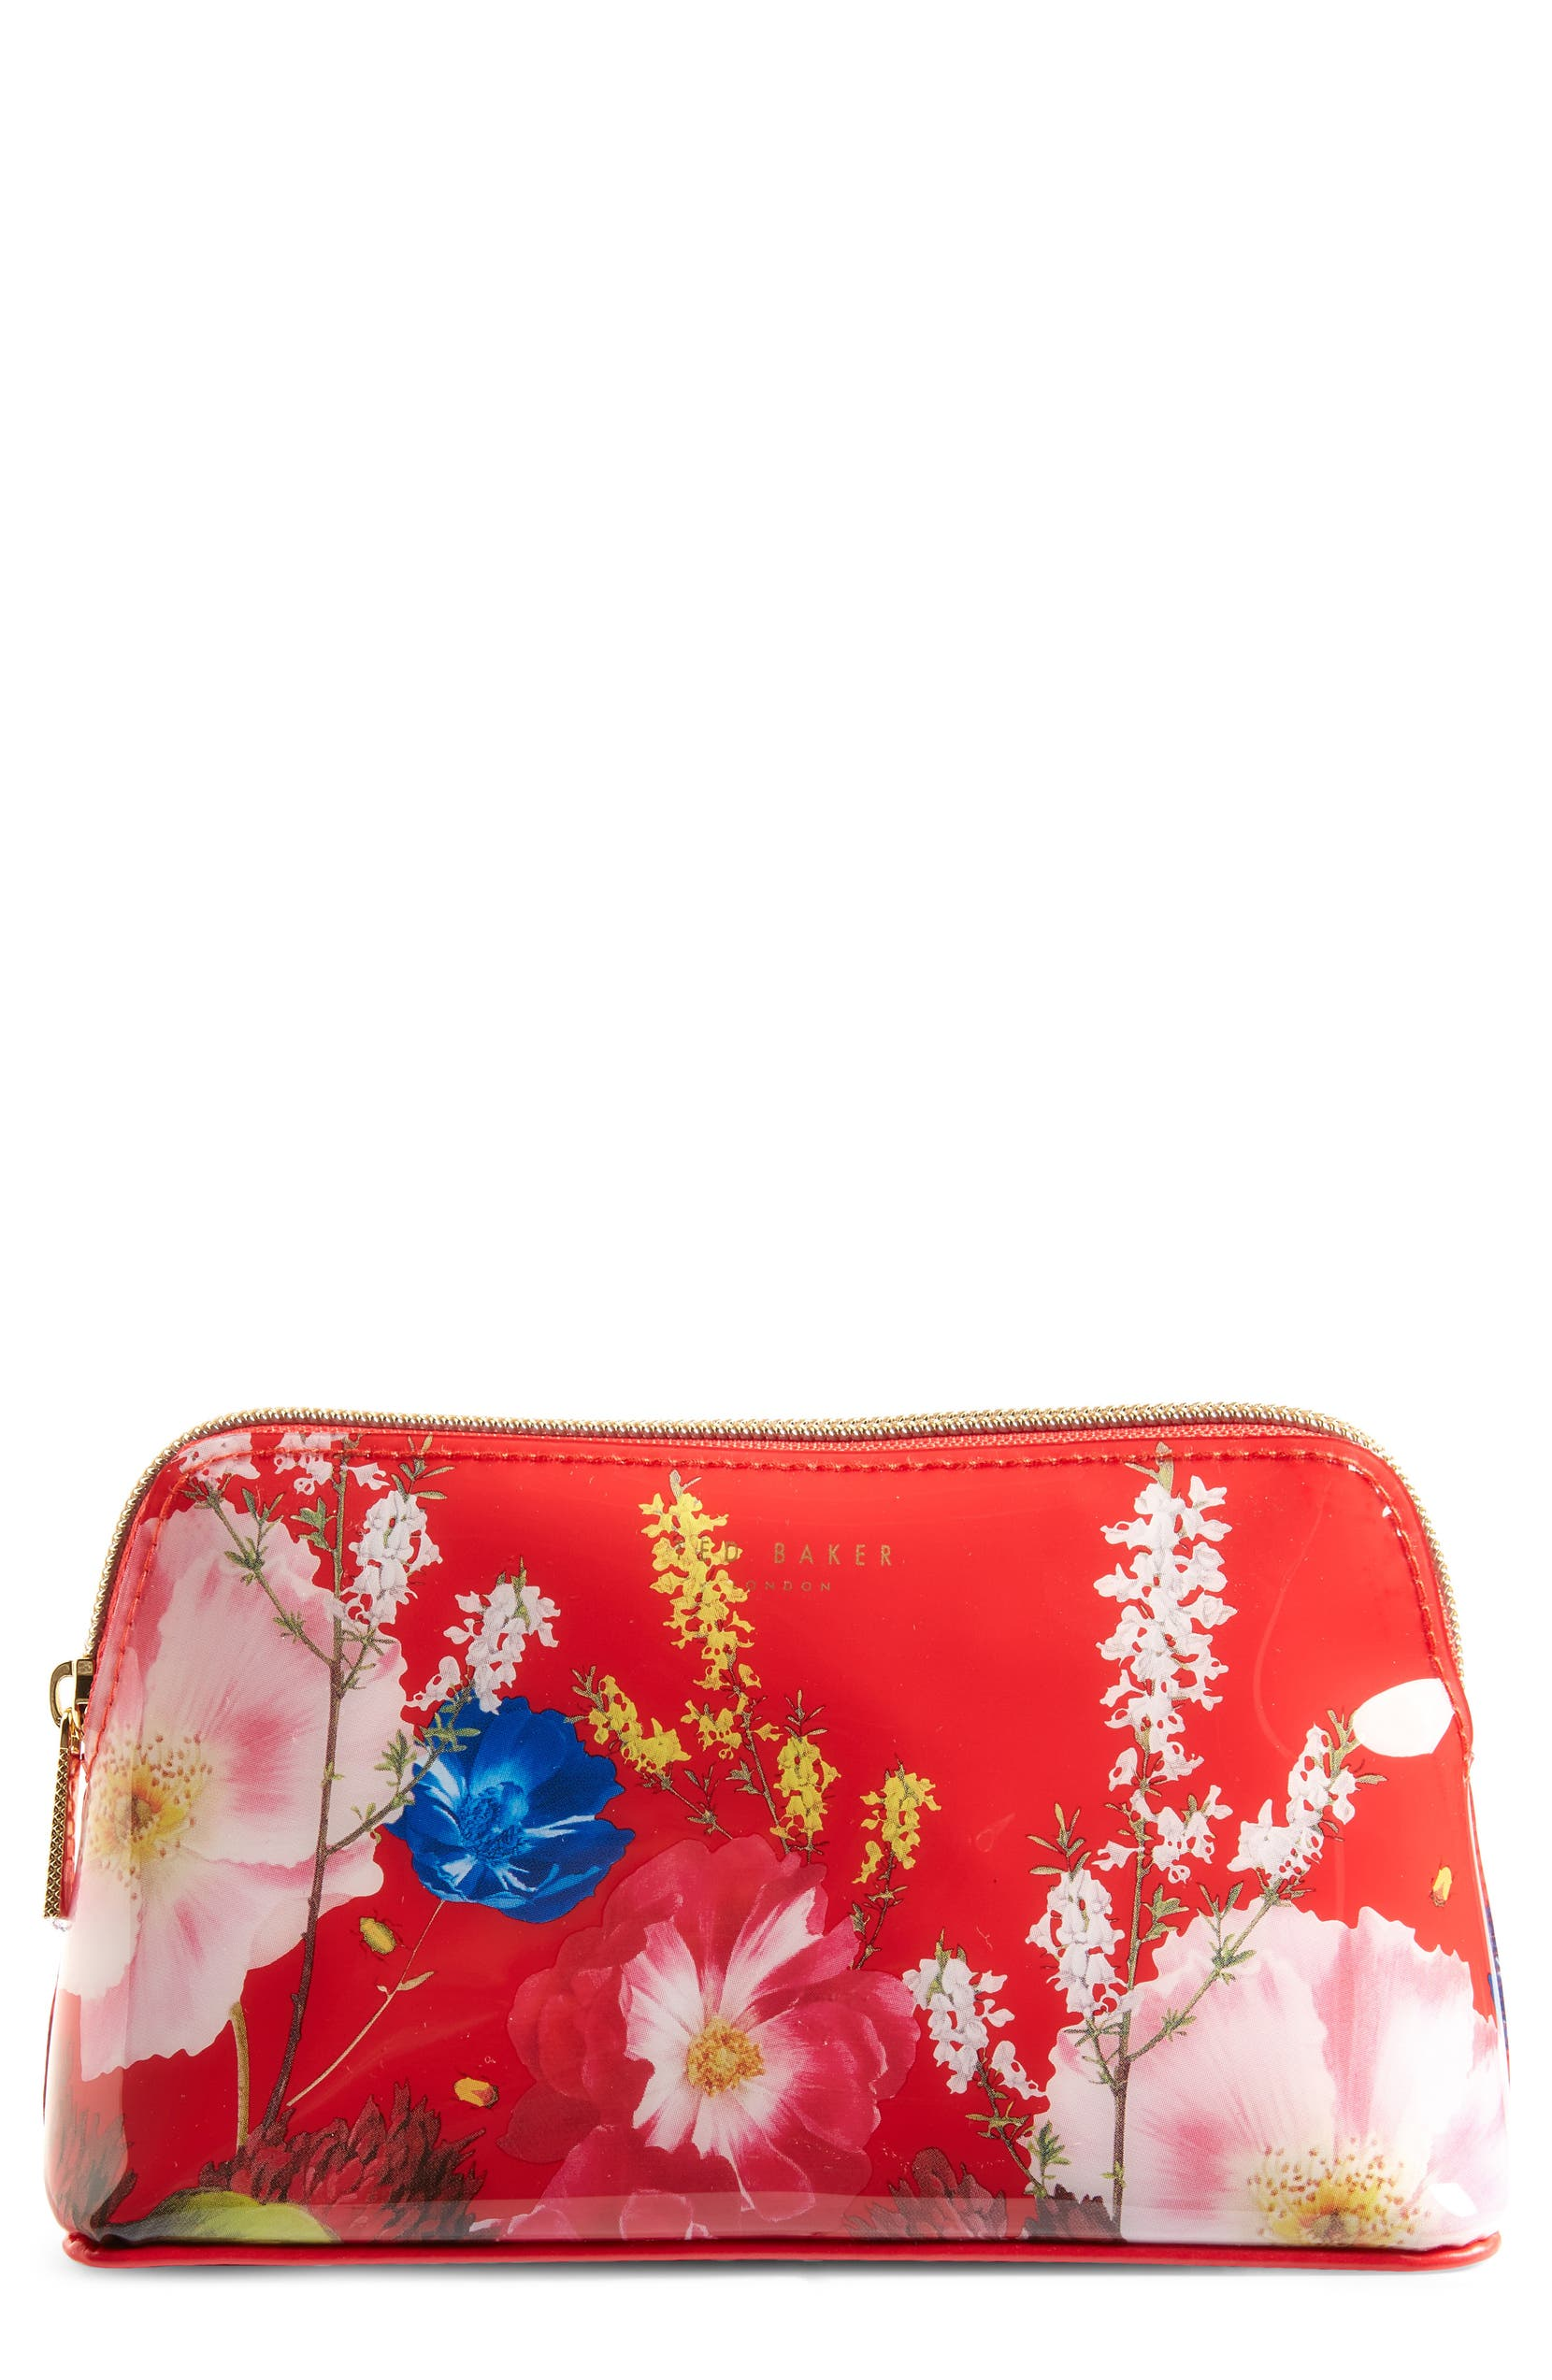 5da3cd3b3 Ted Baker London Berry Sundae Floral Cosmetics Case